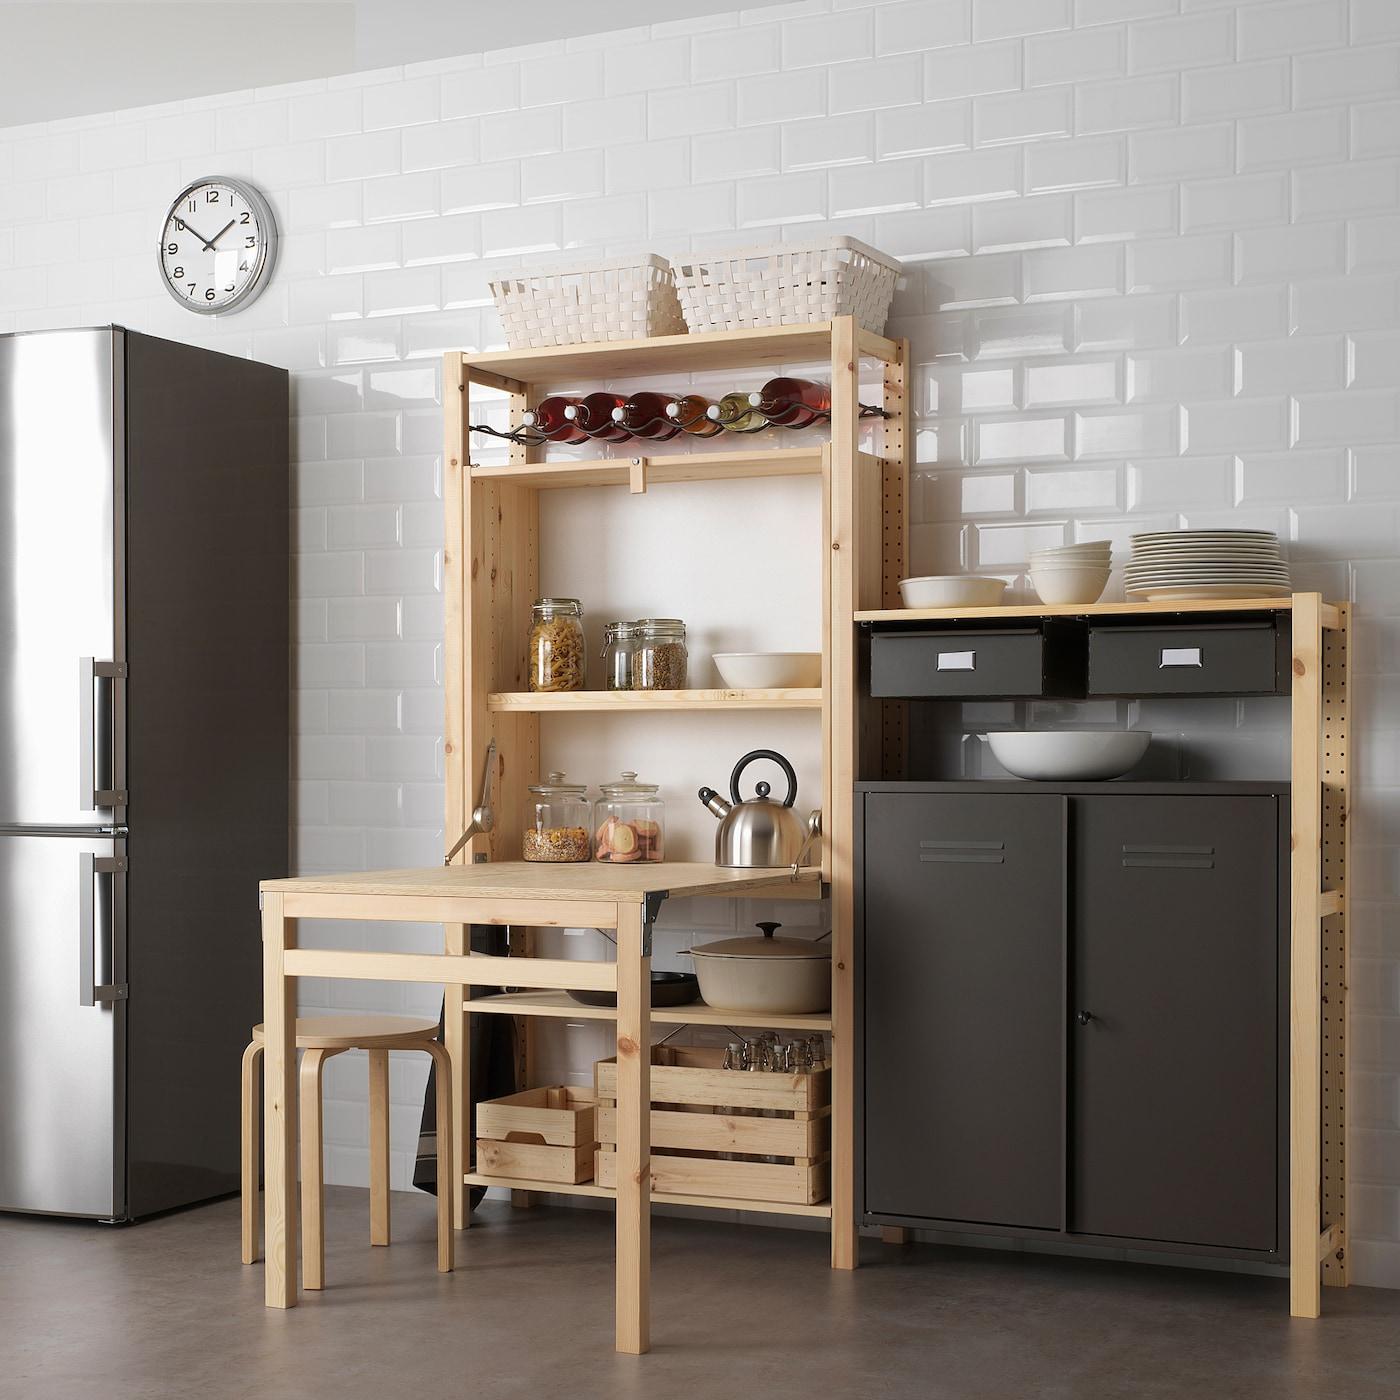 Ikea IVAR Cabinet Cupboard,Solid Pine,Huge Storage Unit,Two sizes,Multipurpose